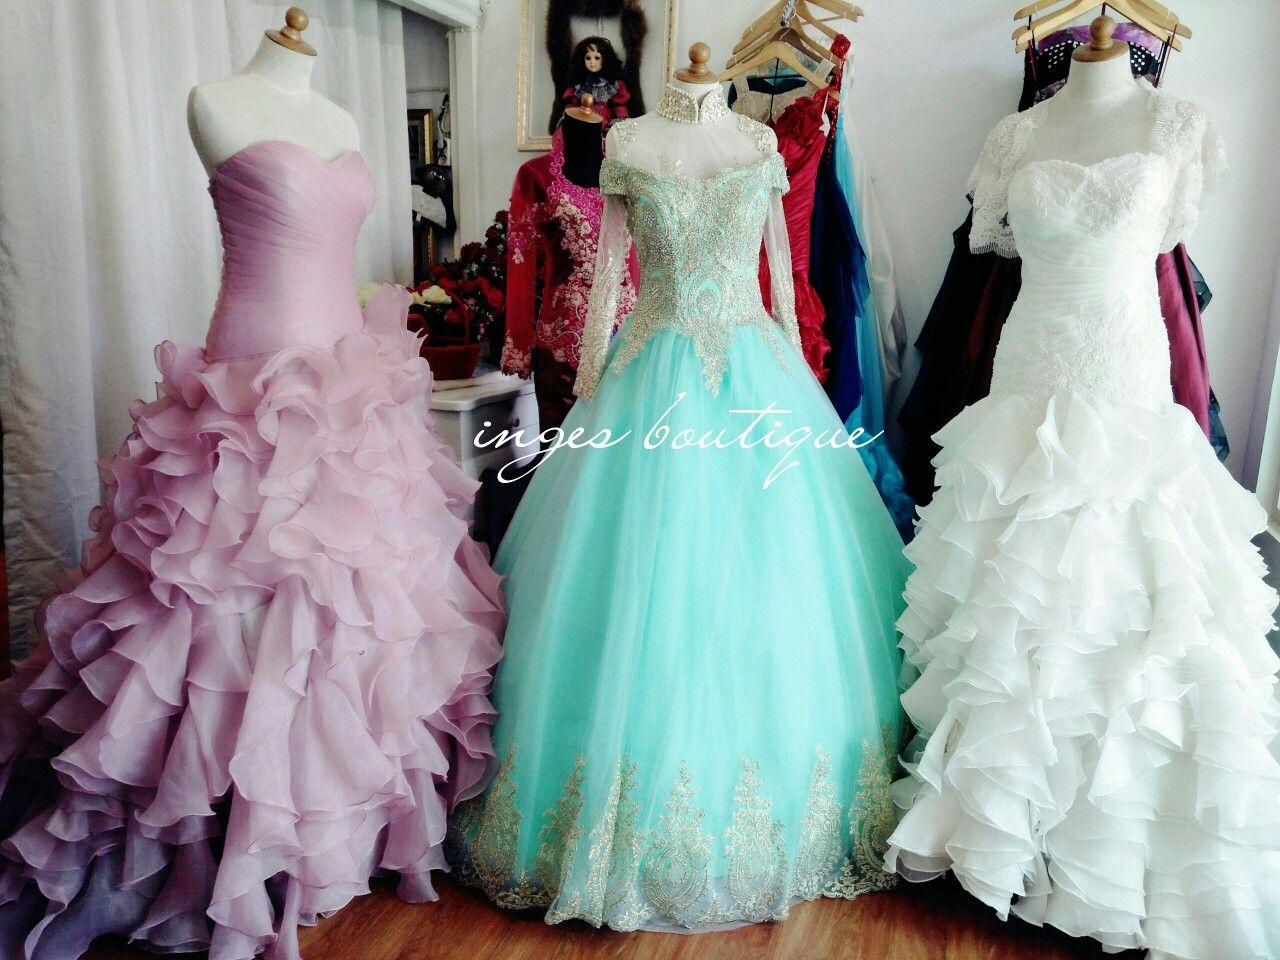 9 best gown images on Pinterest | Bridal dresses, Boutique and Boutiques